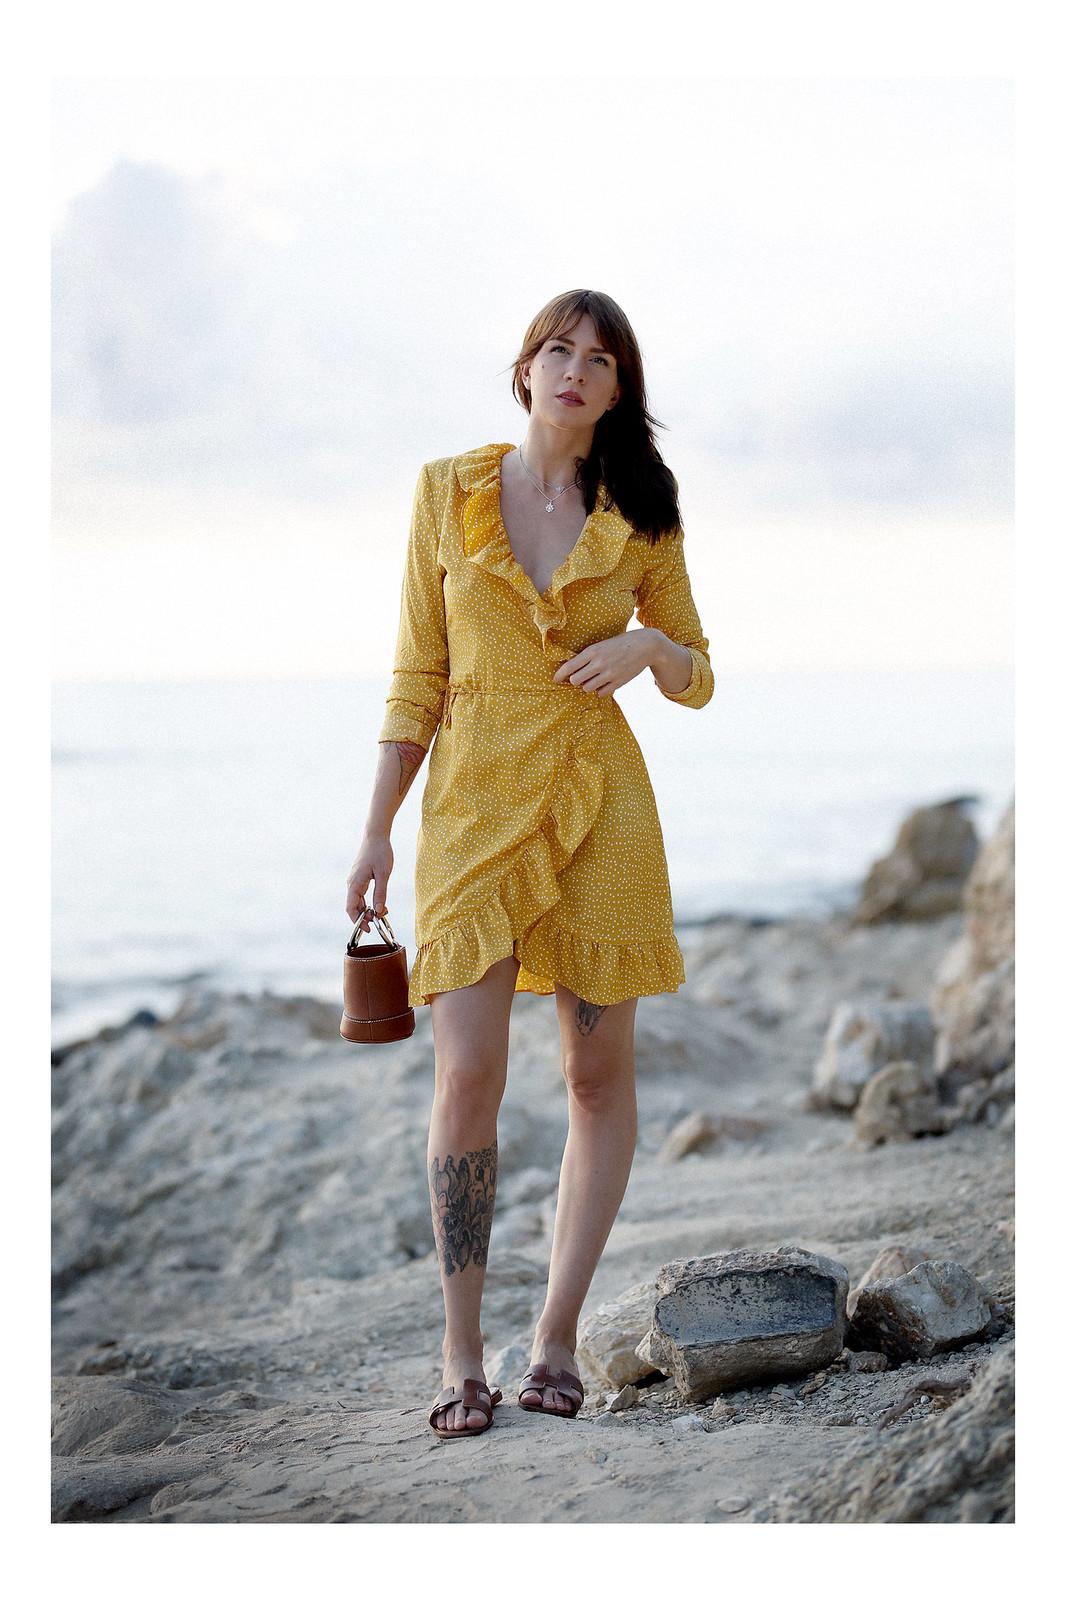 vila yellow mustard polka dot dress mallorca holiday beach sunrise moody style fashionblogger cats & dogs modeblog ricarda schernus fotograf max bechmann düsseldorf travelbloggers roamers 6